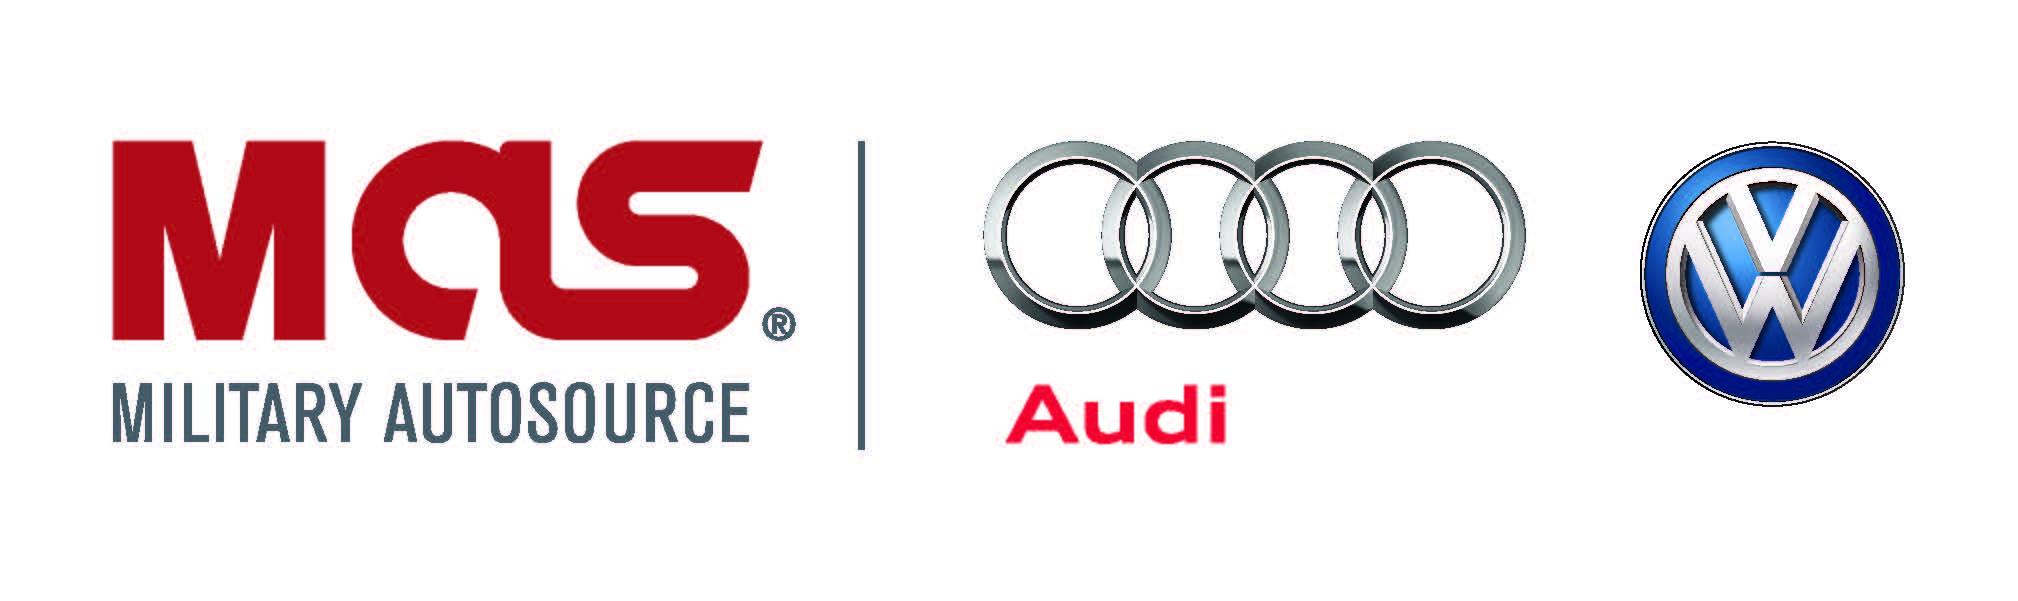 AX8753_MWR_Logos_6-Audi-VW.jpg